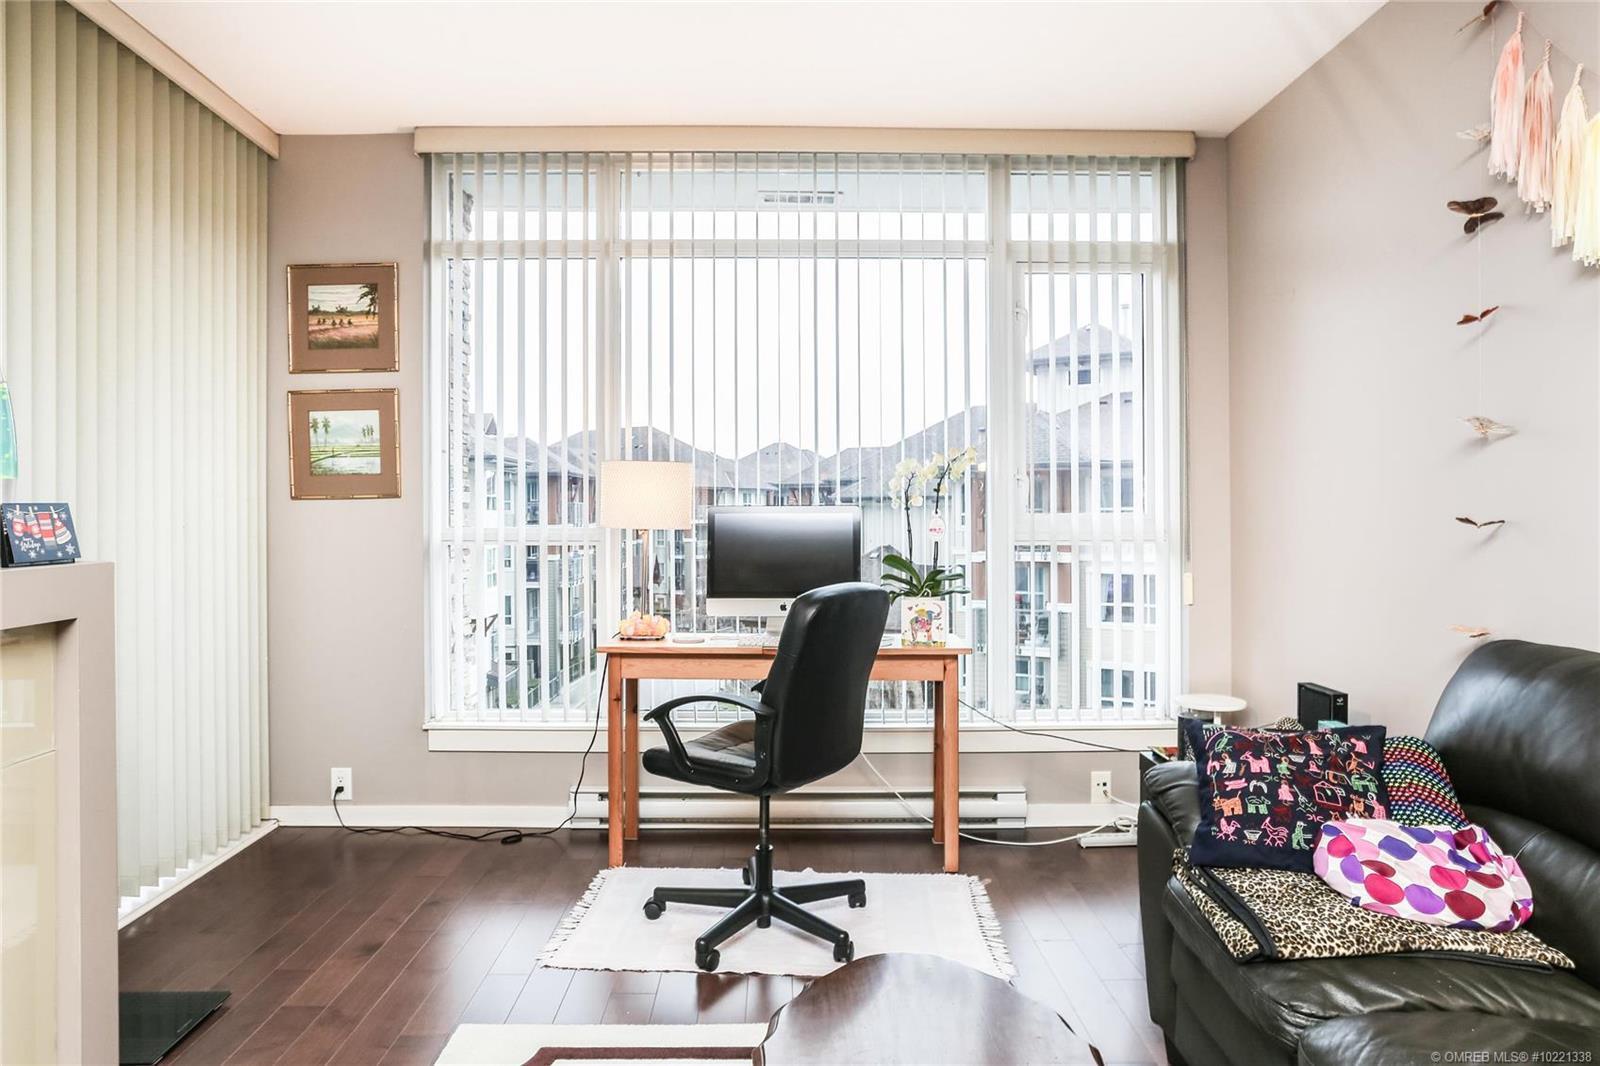 #404 1075 Sunset Drive, - Kelowna Apartment for sale, 1 Bedroom (10221338) - #9